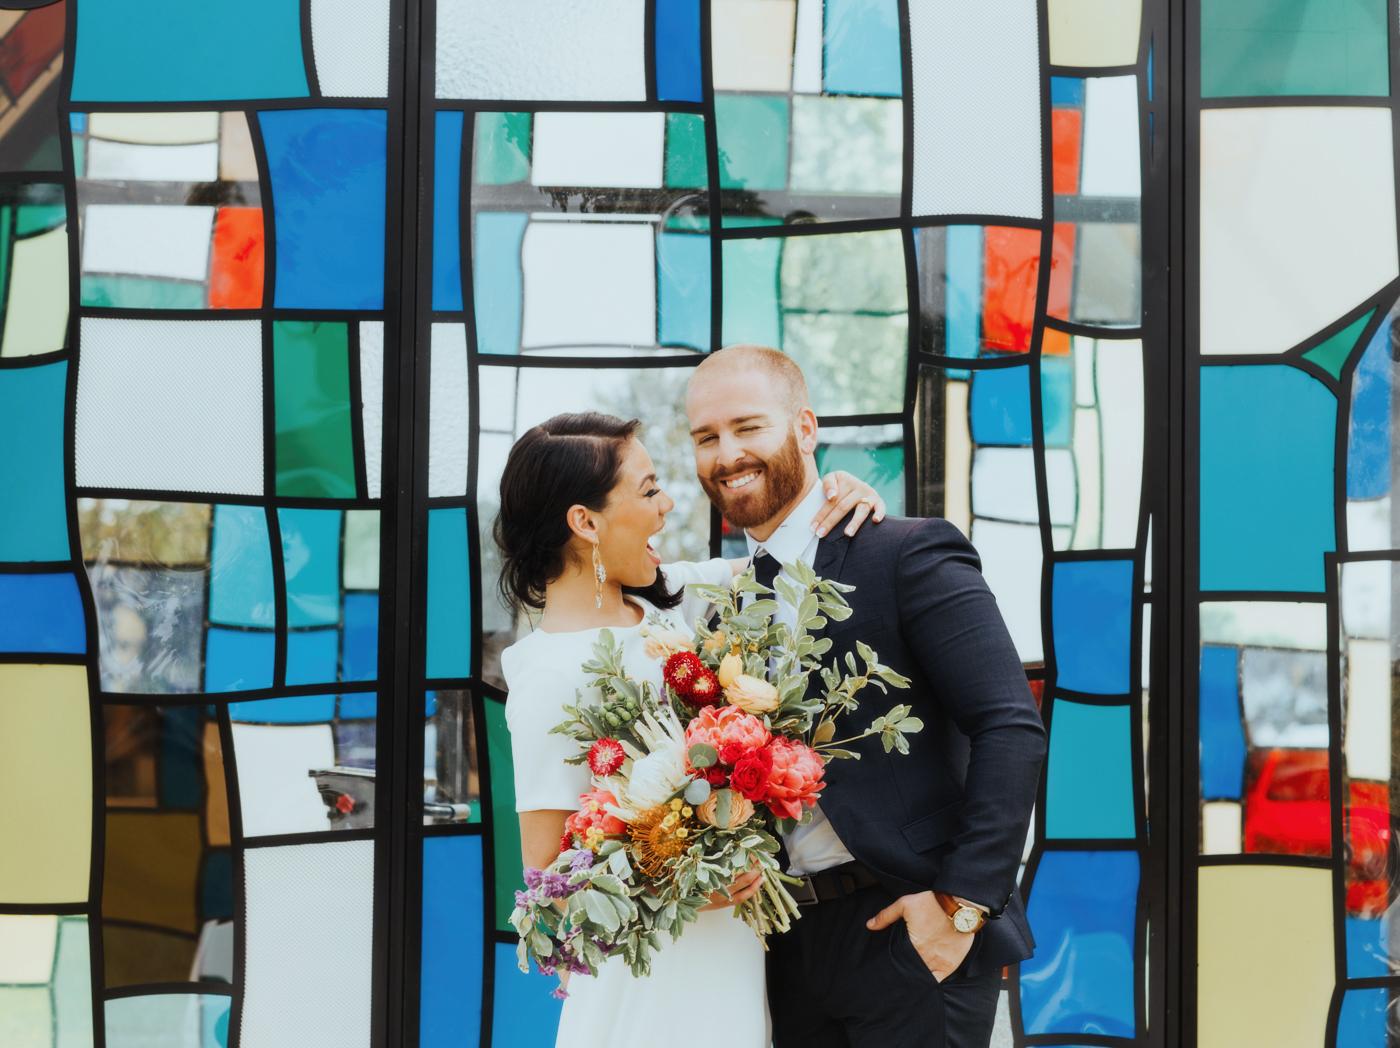 Wedding | Canvas Market | Lake Nona-Orlando, FL  | Vanessa Boy Photography | vanessaboy.com-266.com |Green Wedding Shoes.jpg